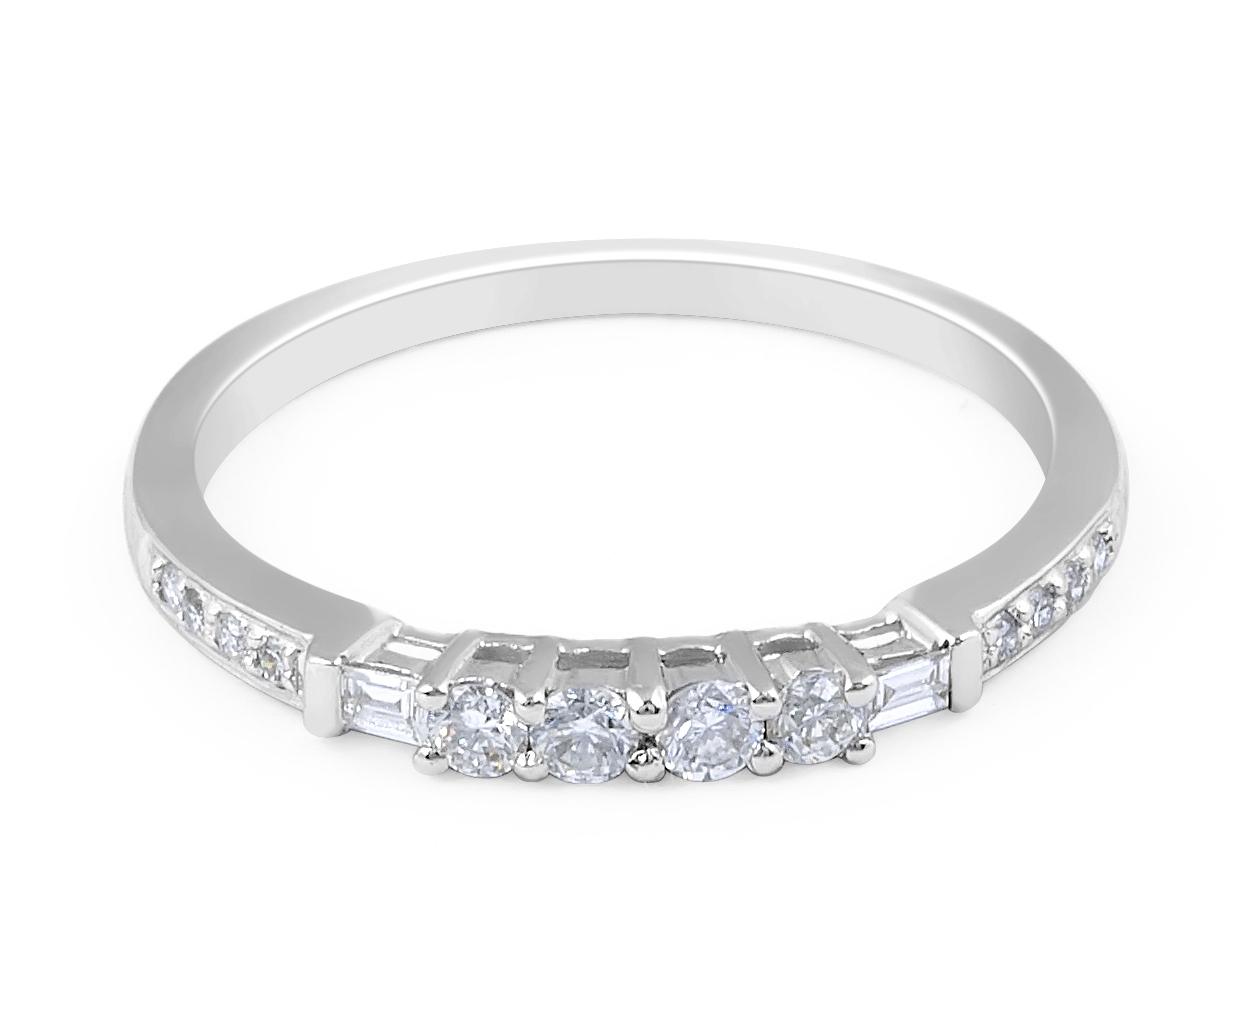 18 Karat White Gold Modern Classic Design Diamond Wedding Band